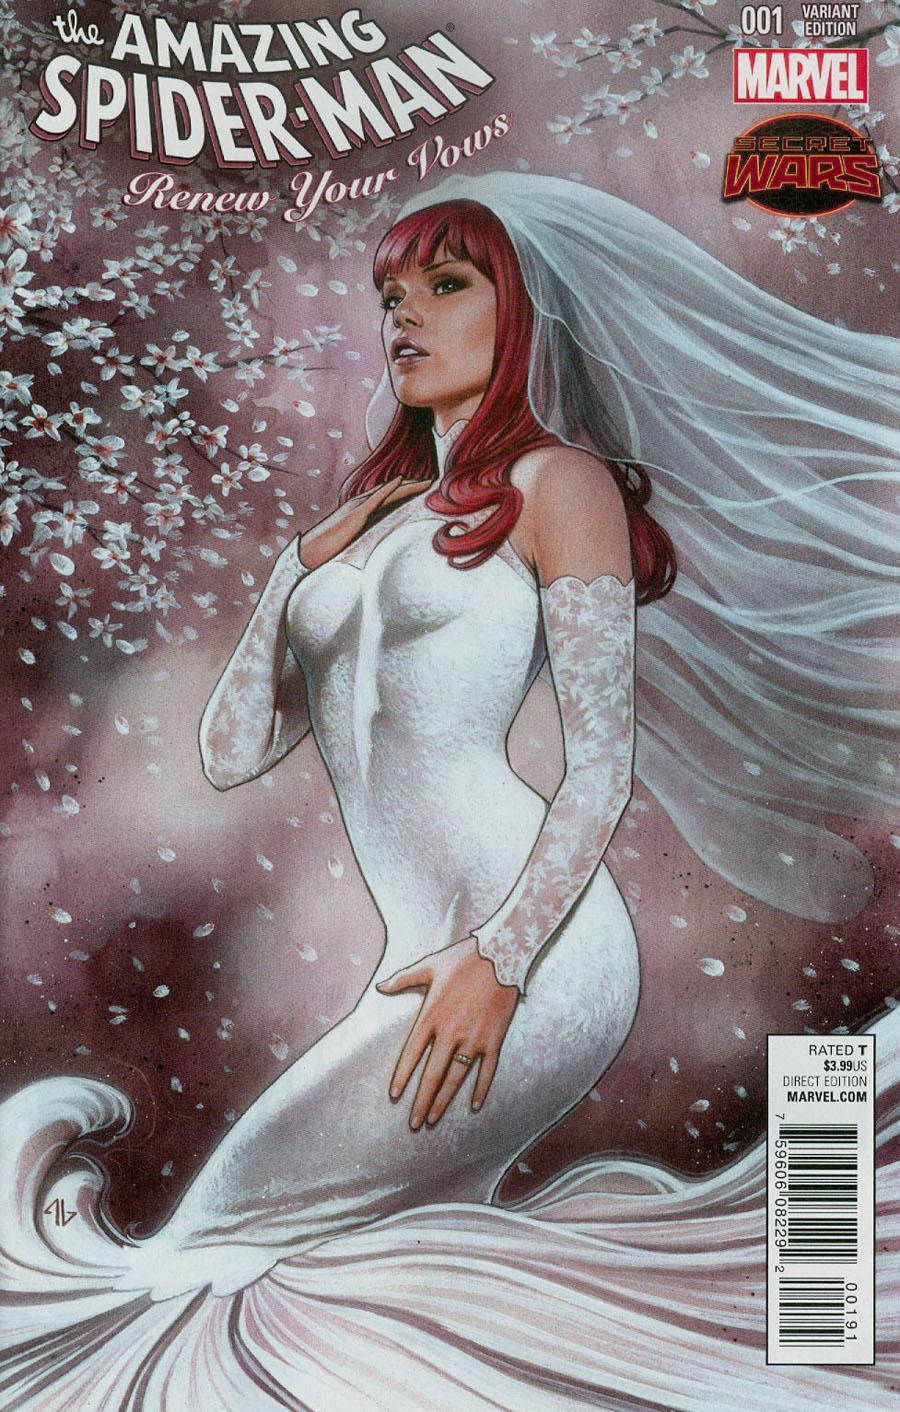 Amazing Spider-Man Renew Your Vows #1 Cover C Exclusive Legacy Edition Adi Granov Color Variant Cover (Secret Wars Warzones Tie-In)